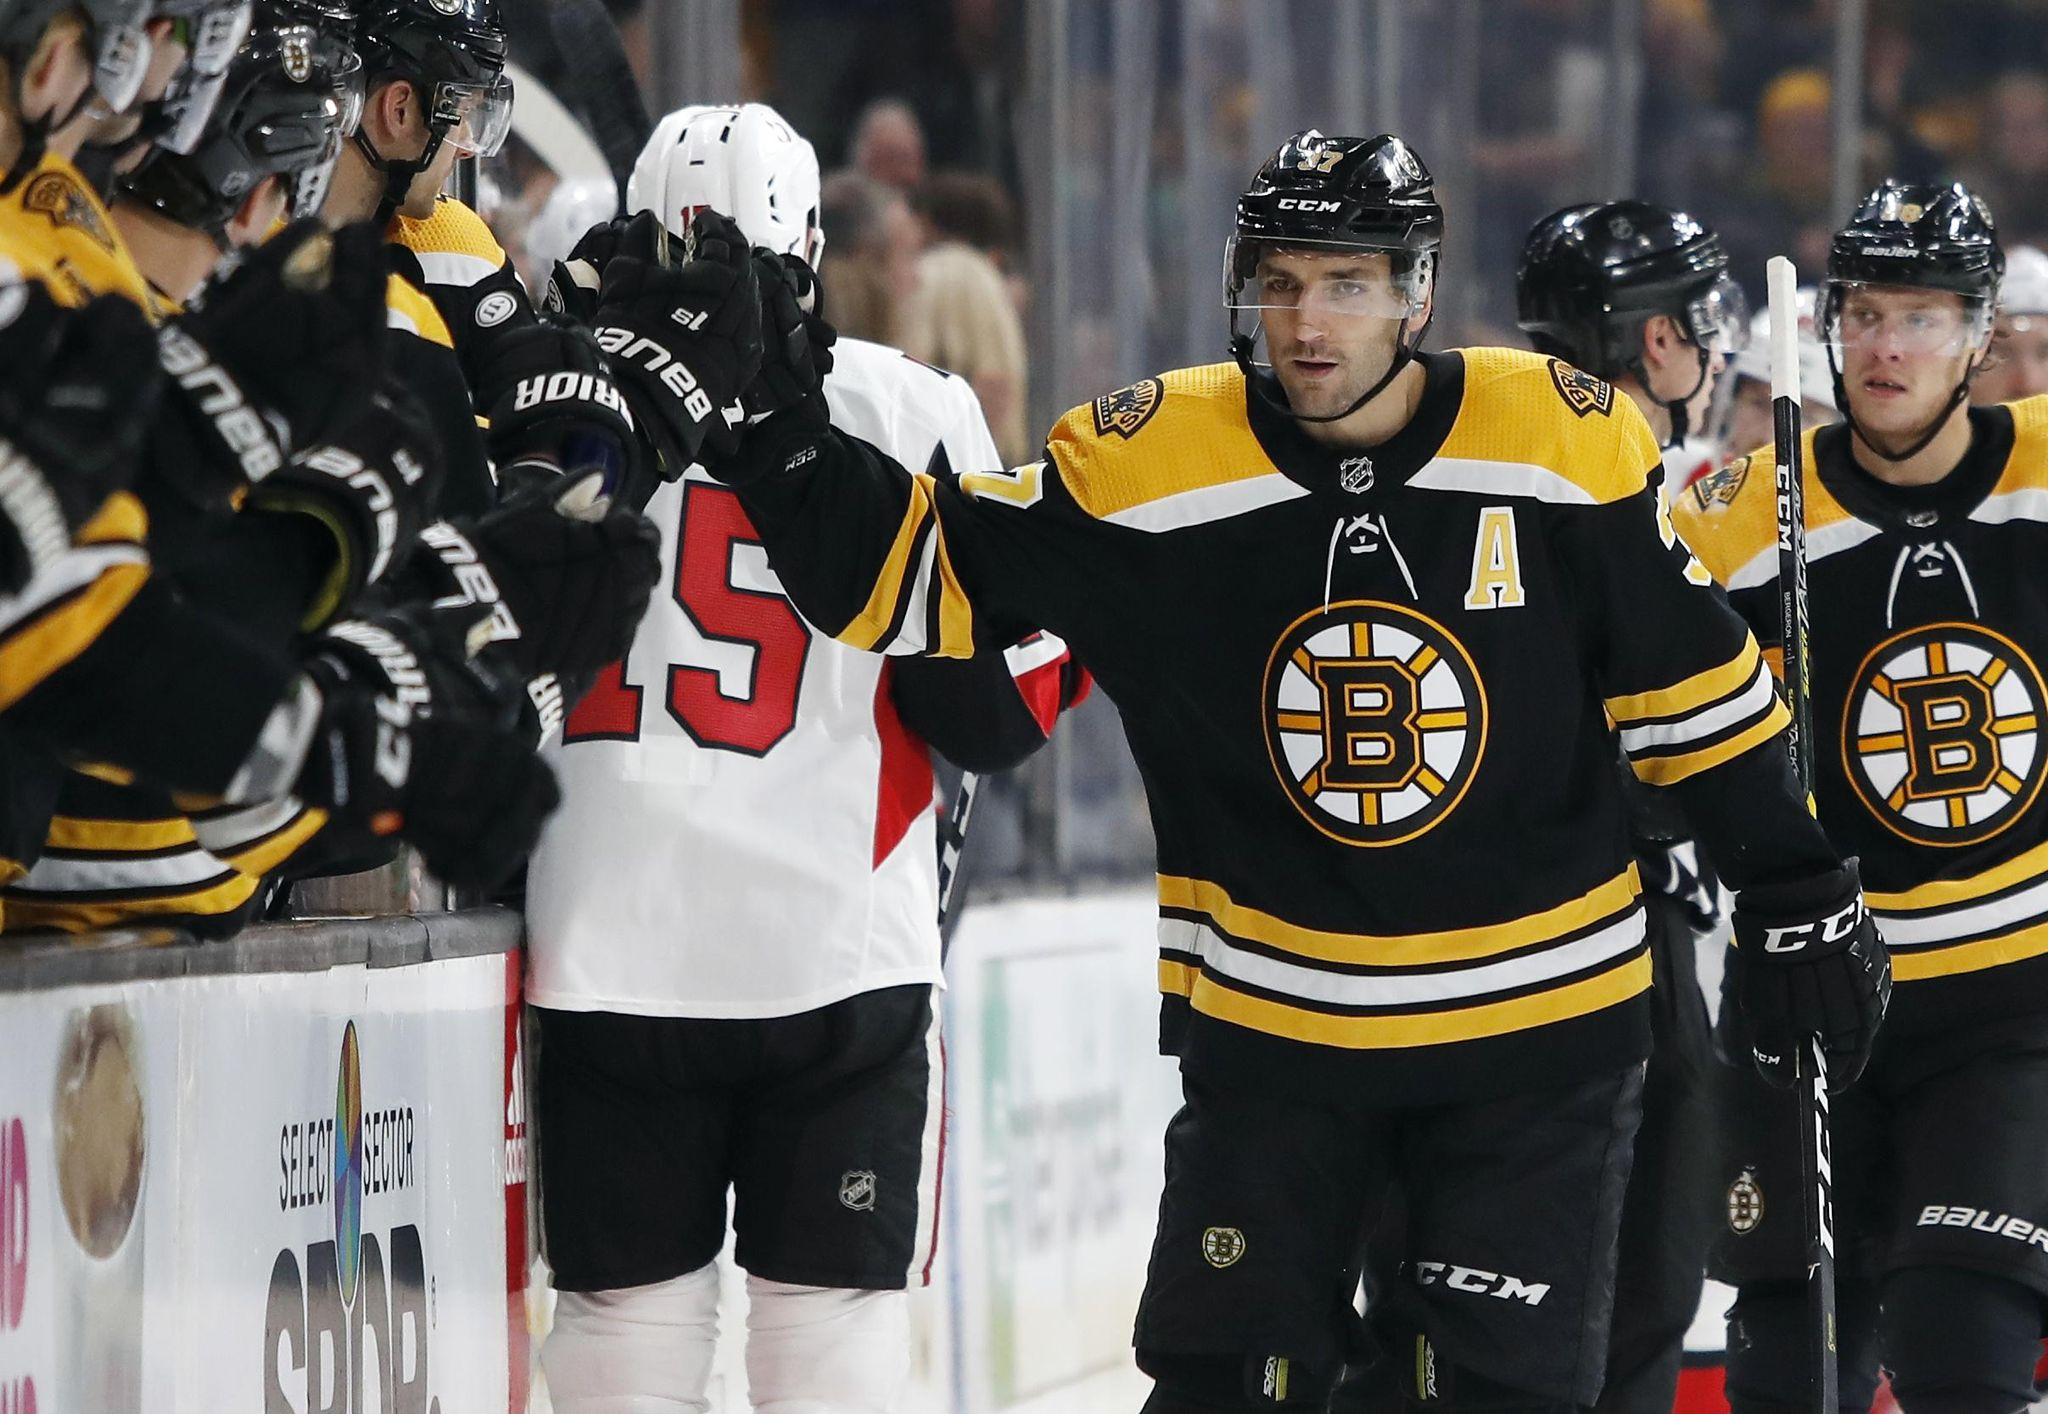 Senators_bruins_hockey_12401_s2048x1414